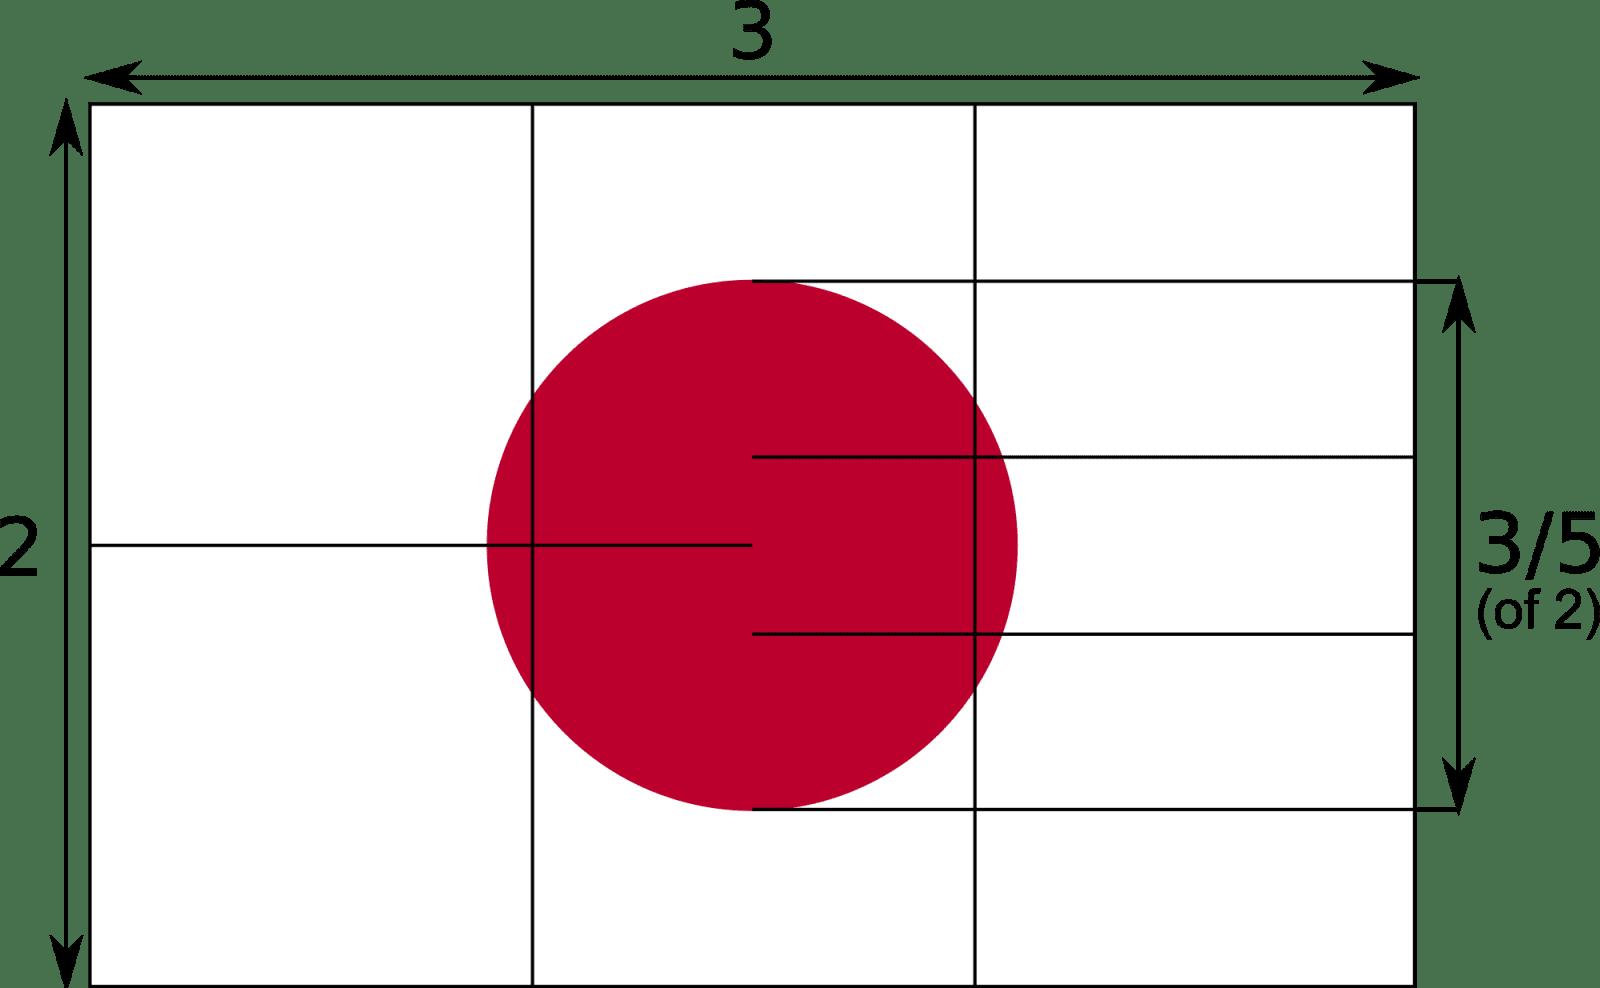 quốc kỳ nhật bản, quốc kỳ của nhật bản, ý nghĩa quốc kỳ nhật bản, hình ảnh quốc kỳ nhật bản, ý nghĩa của quốc kỳ nhật bản, nhật bản thay quốc kỳ